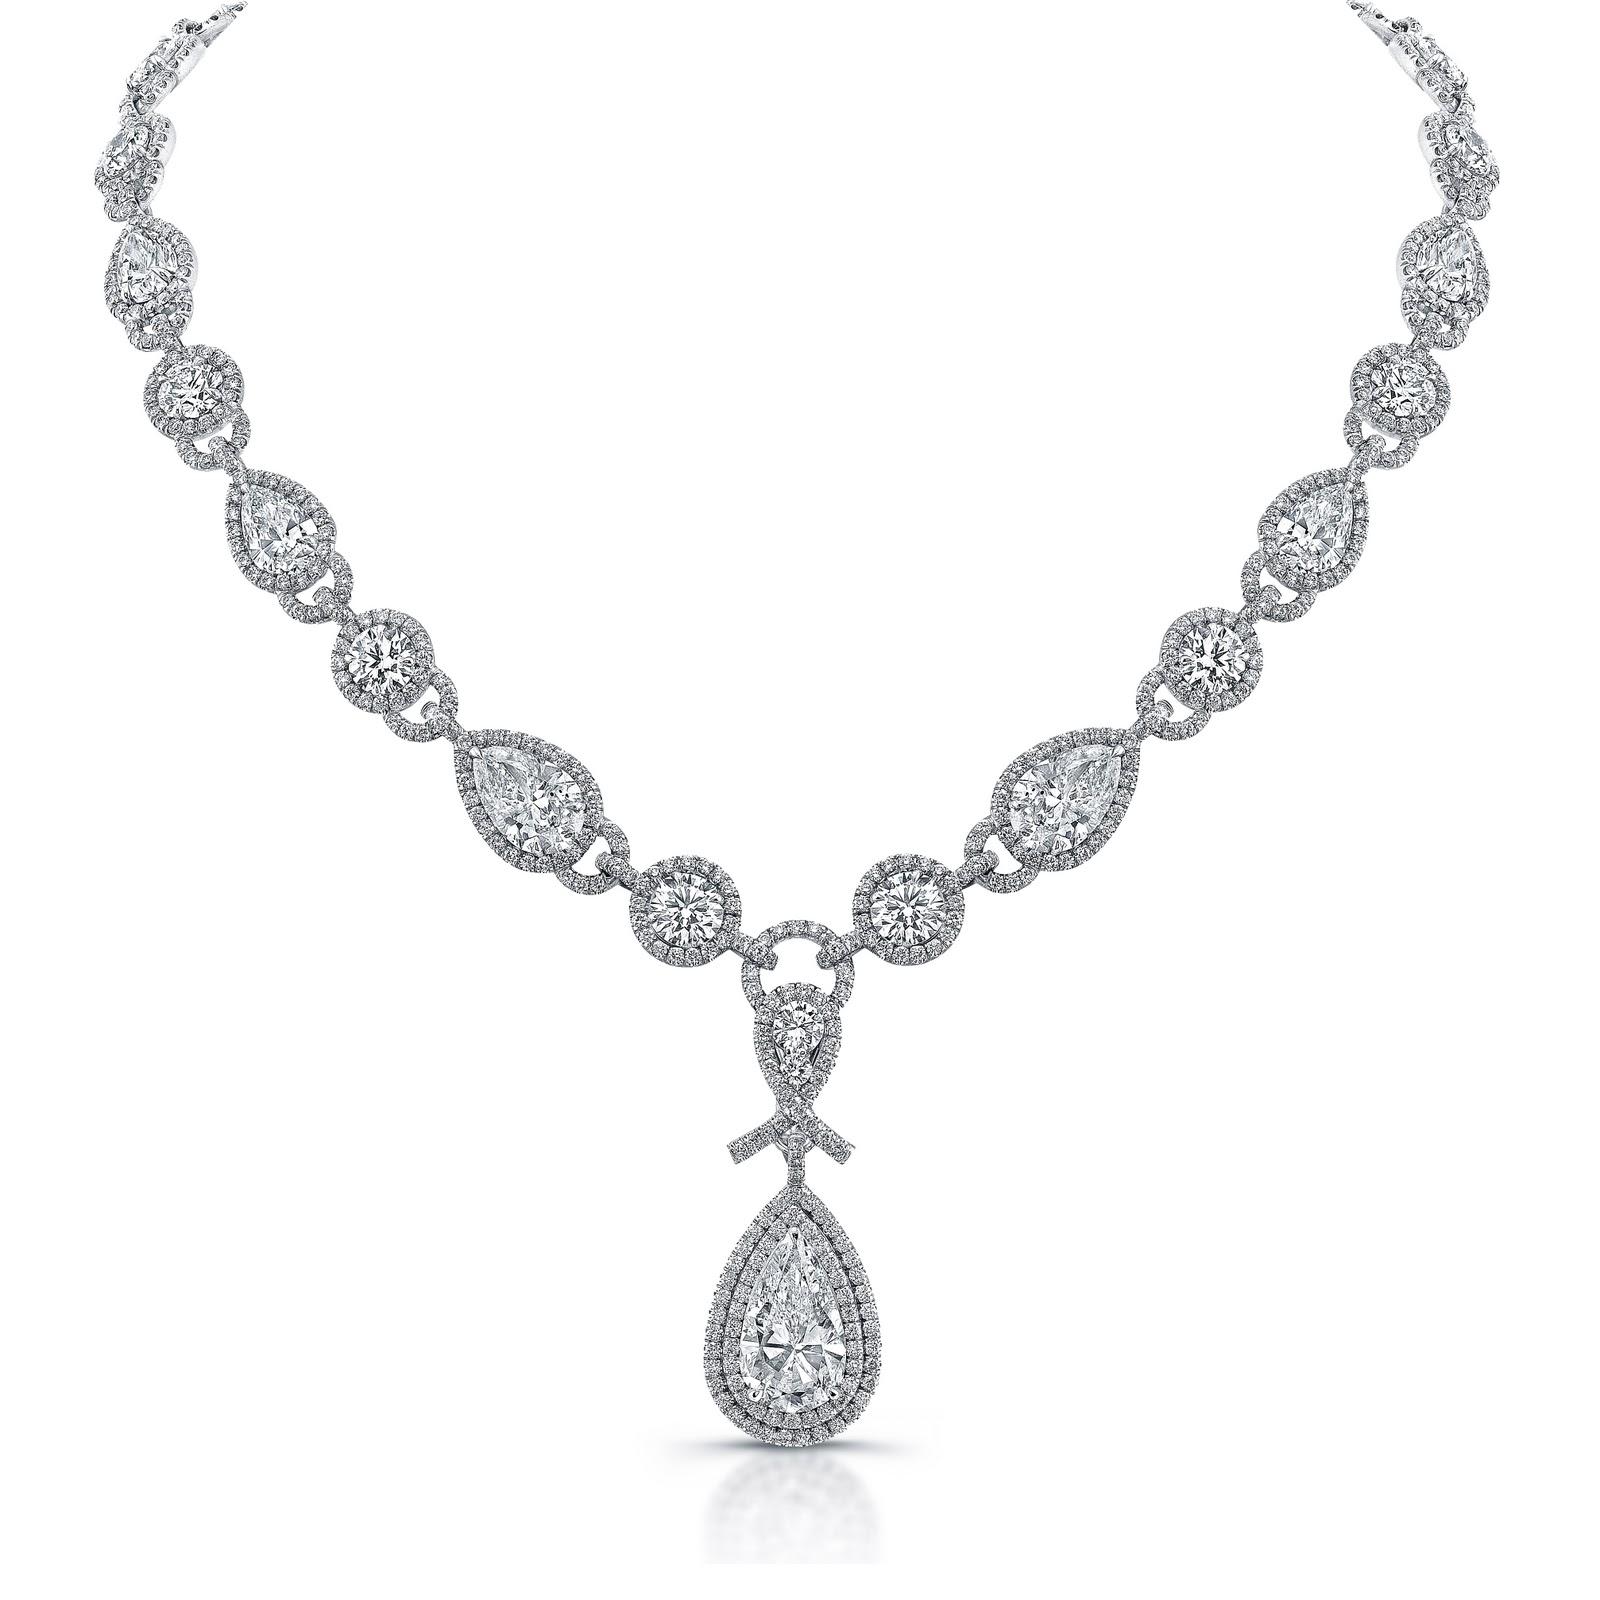 Jewelry News Network Centurion Jewelry Design Winners